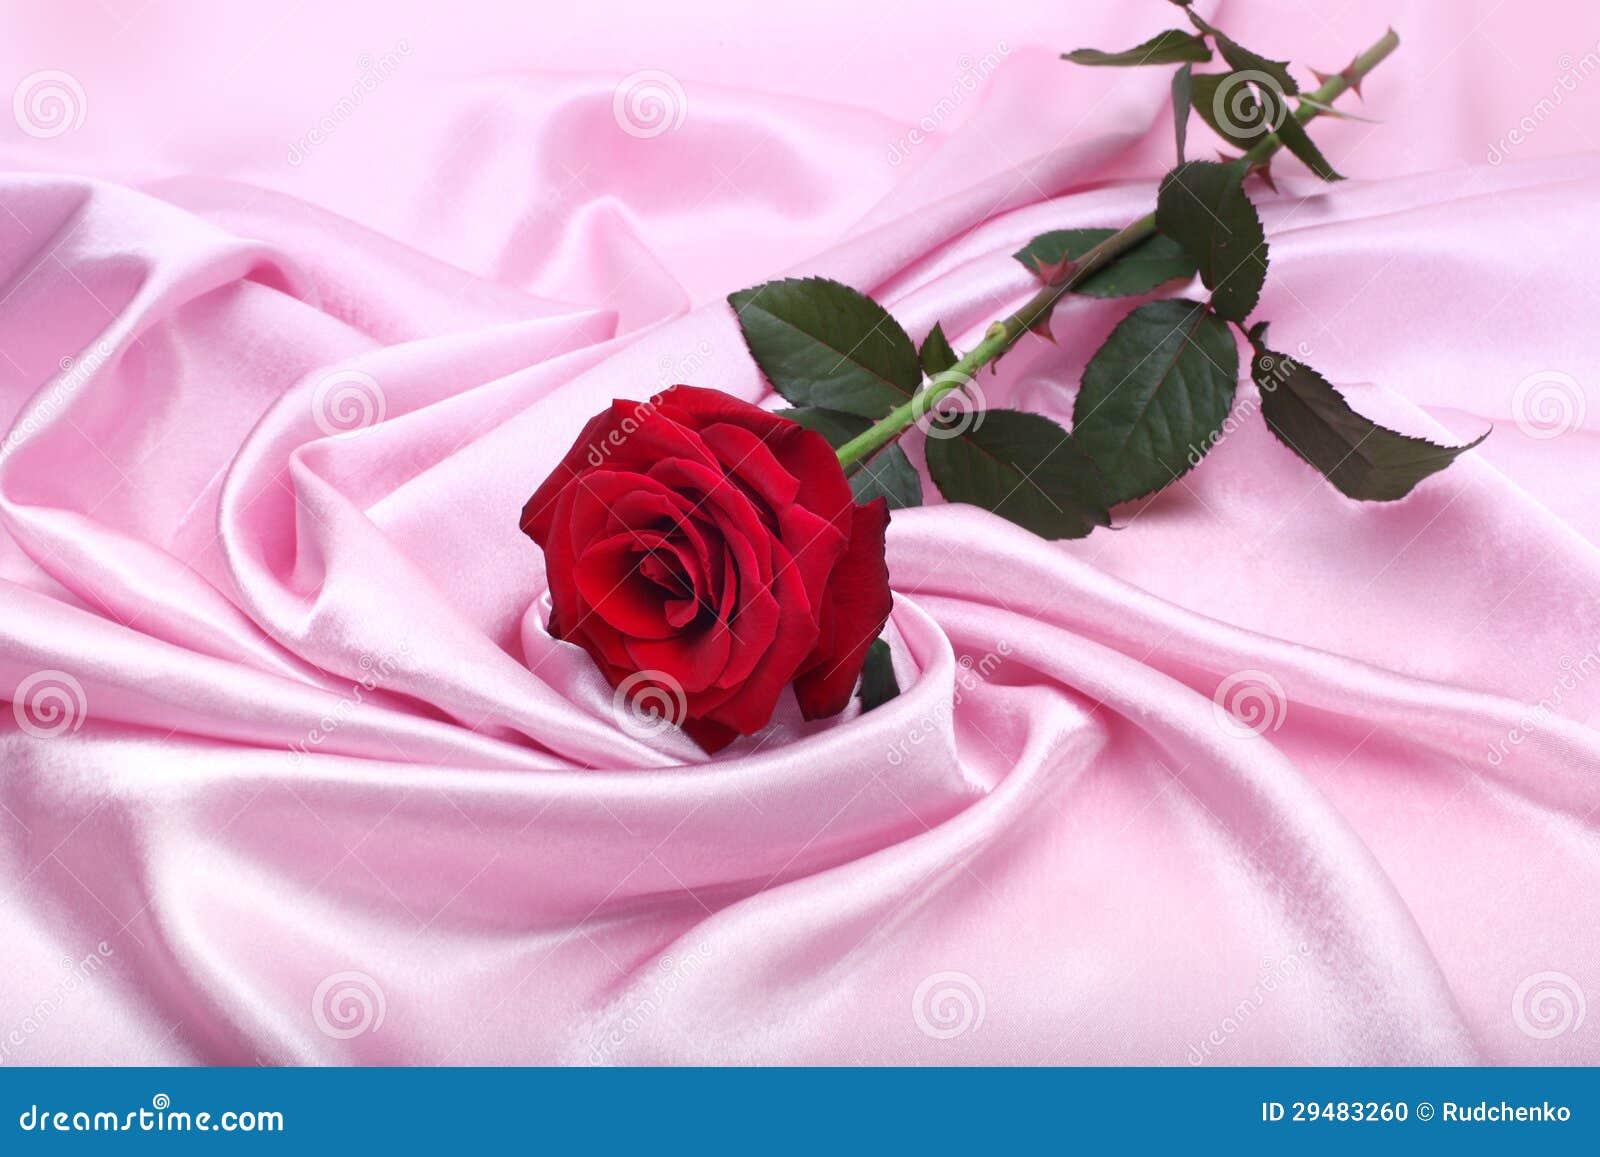 Red Rose On Pink Silk Stock Photo Image Of Wedding Shine